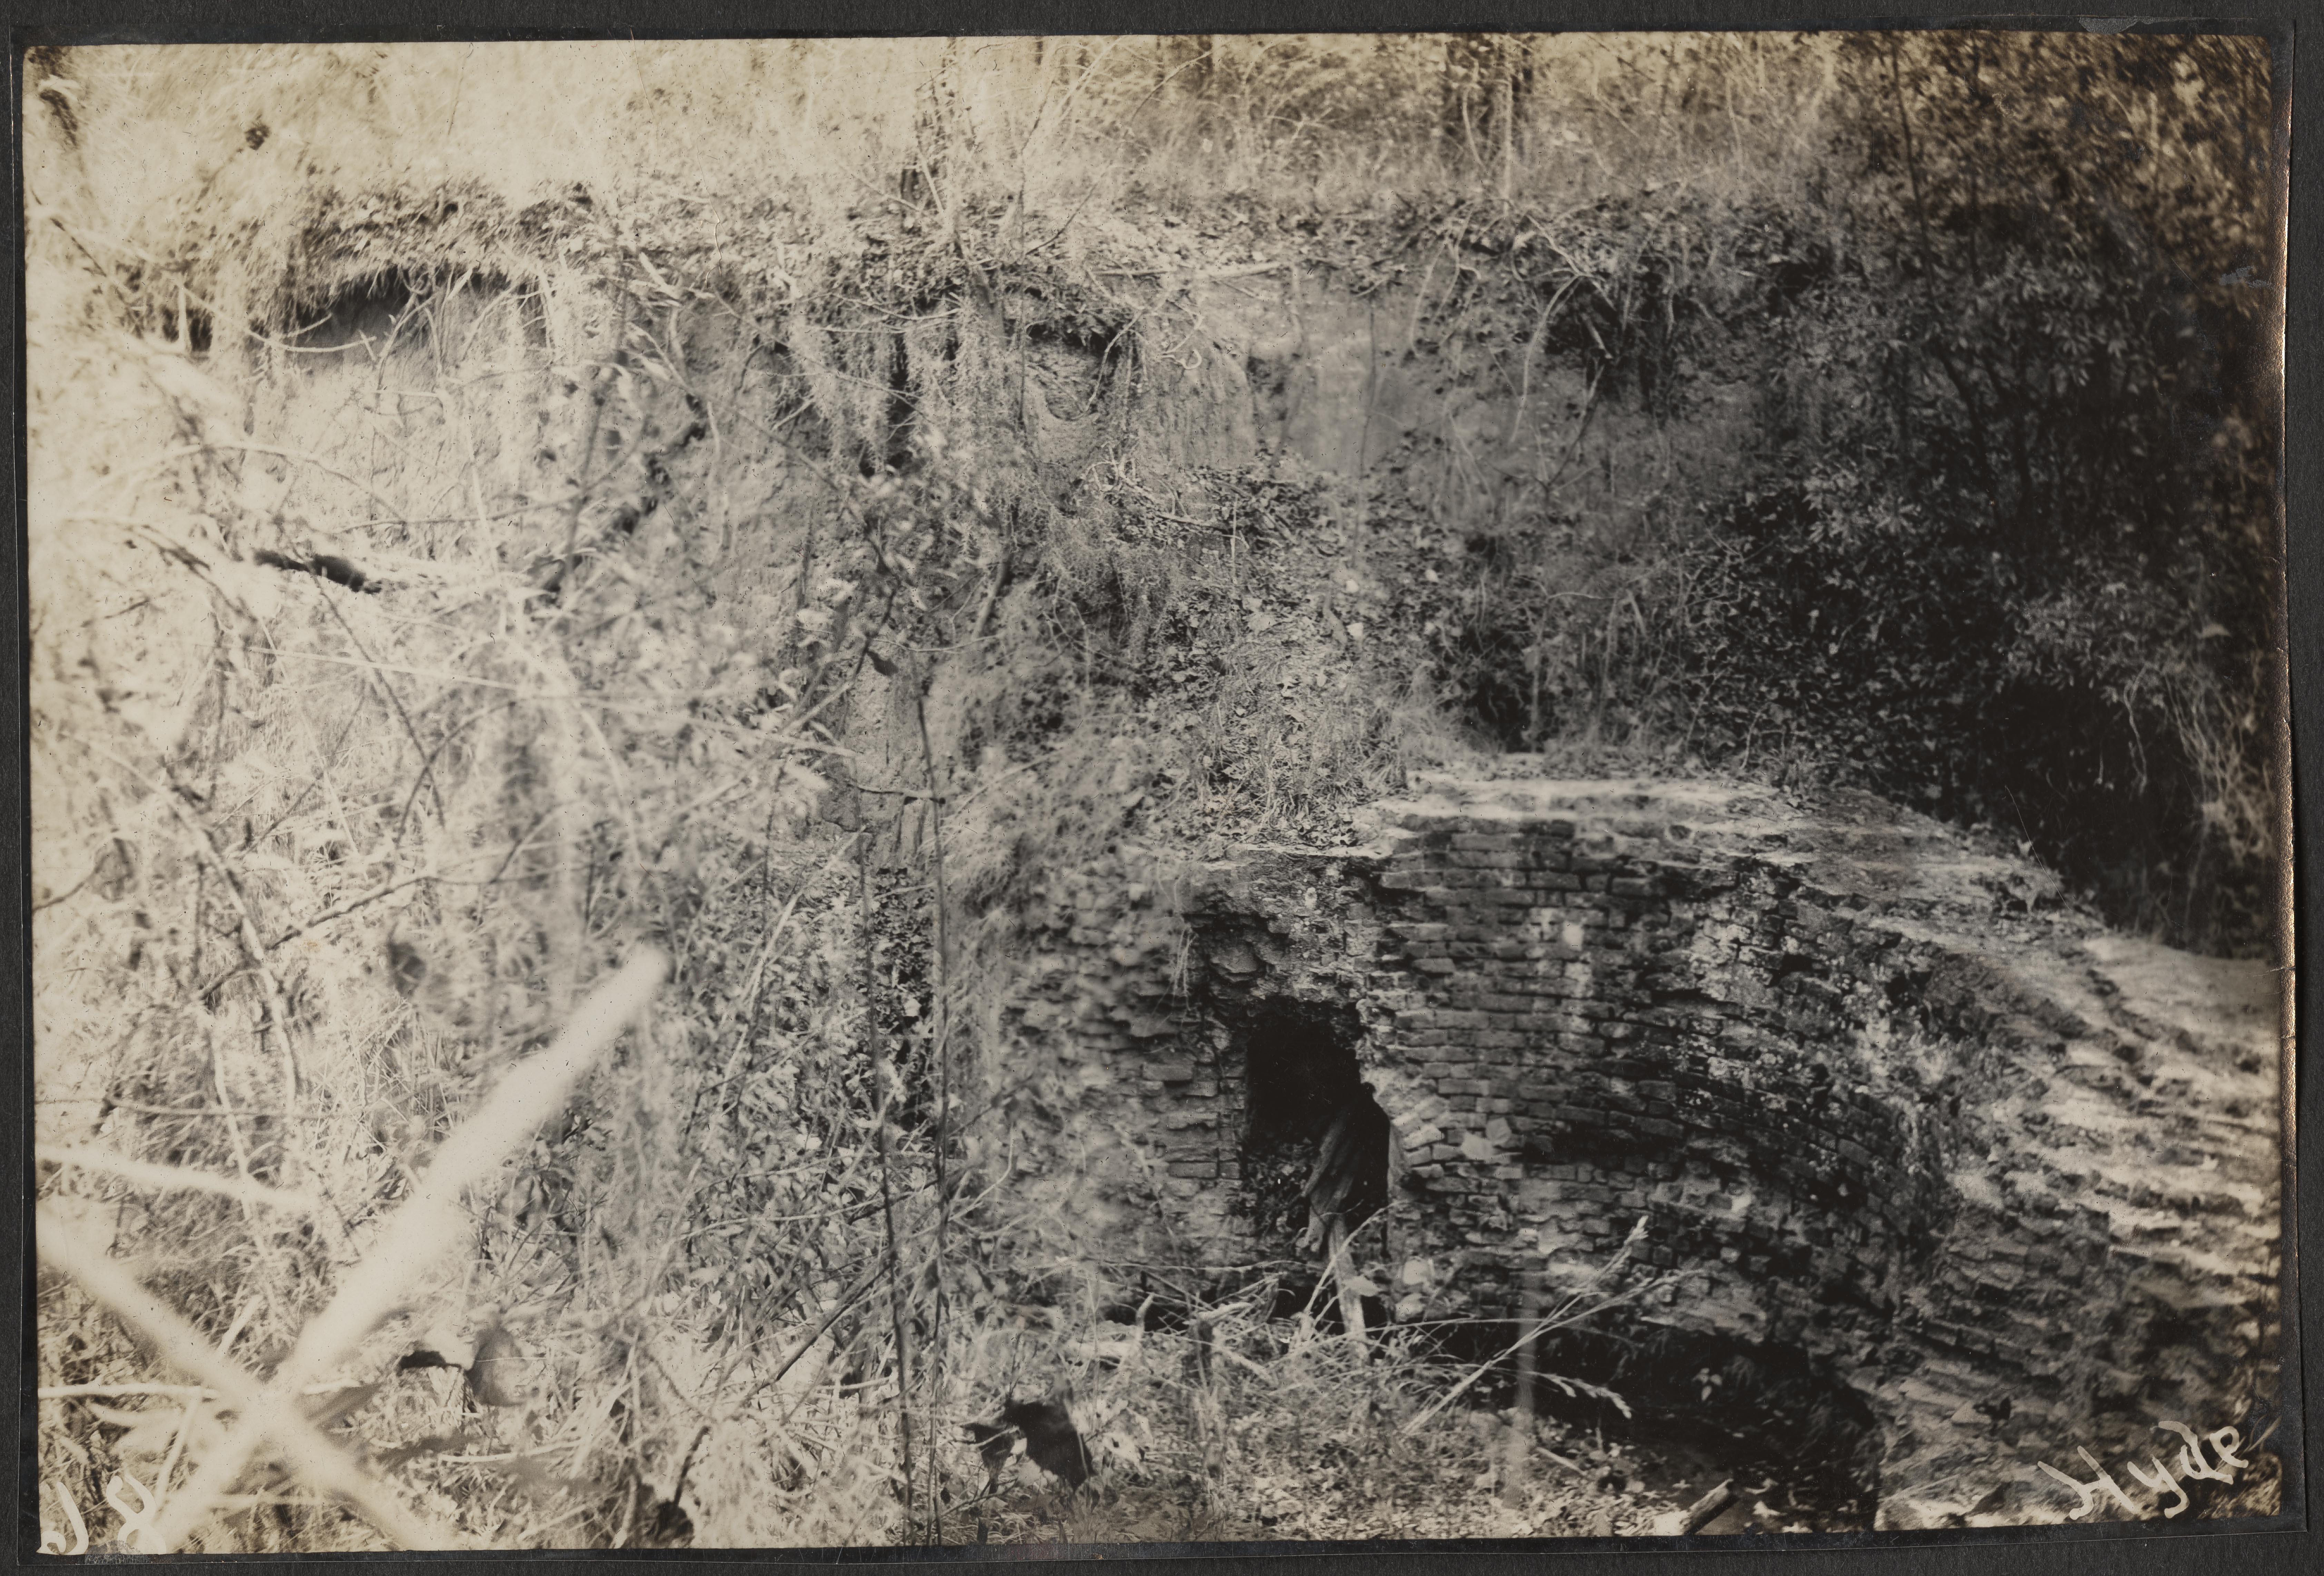 Santee-Cooper Cemetery Investigation 032